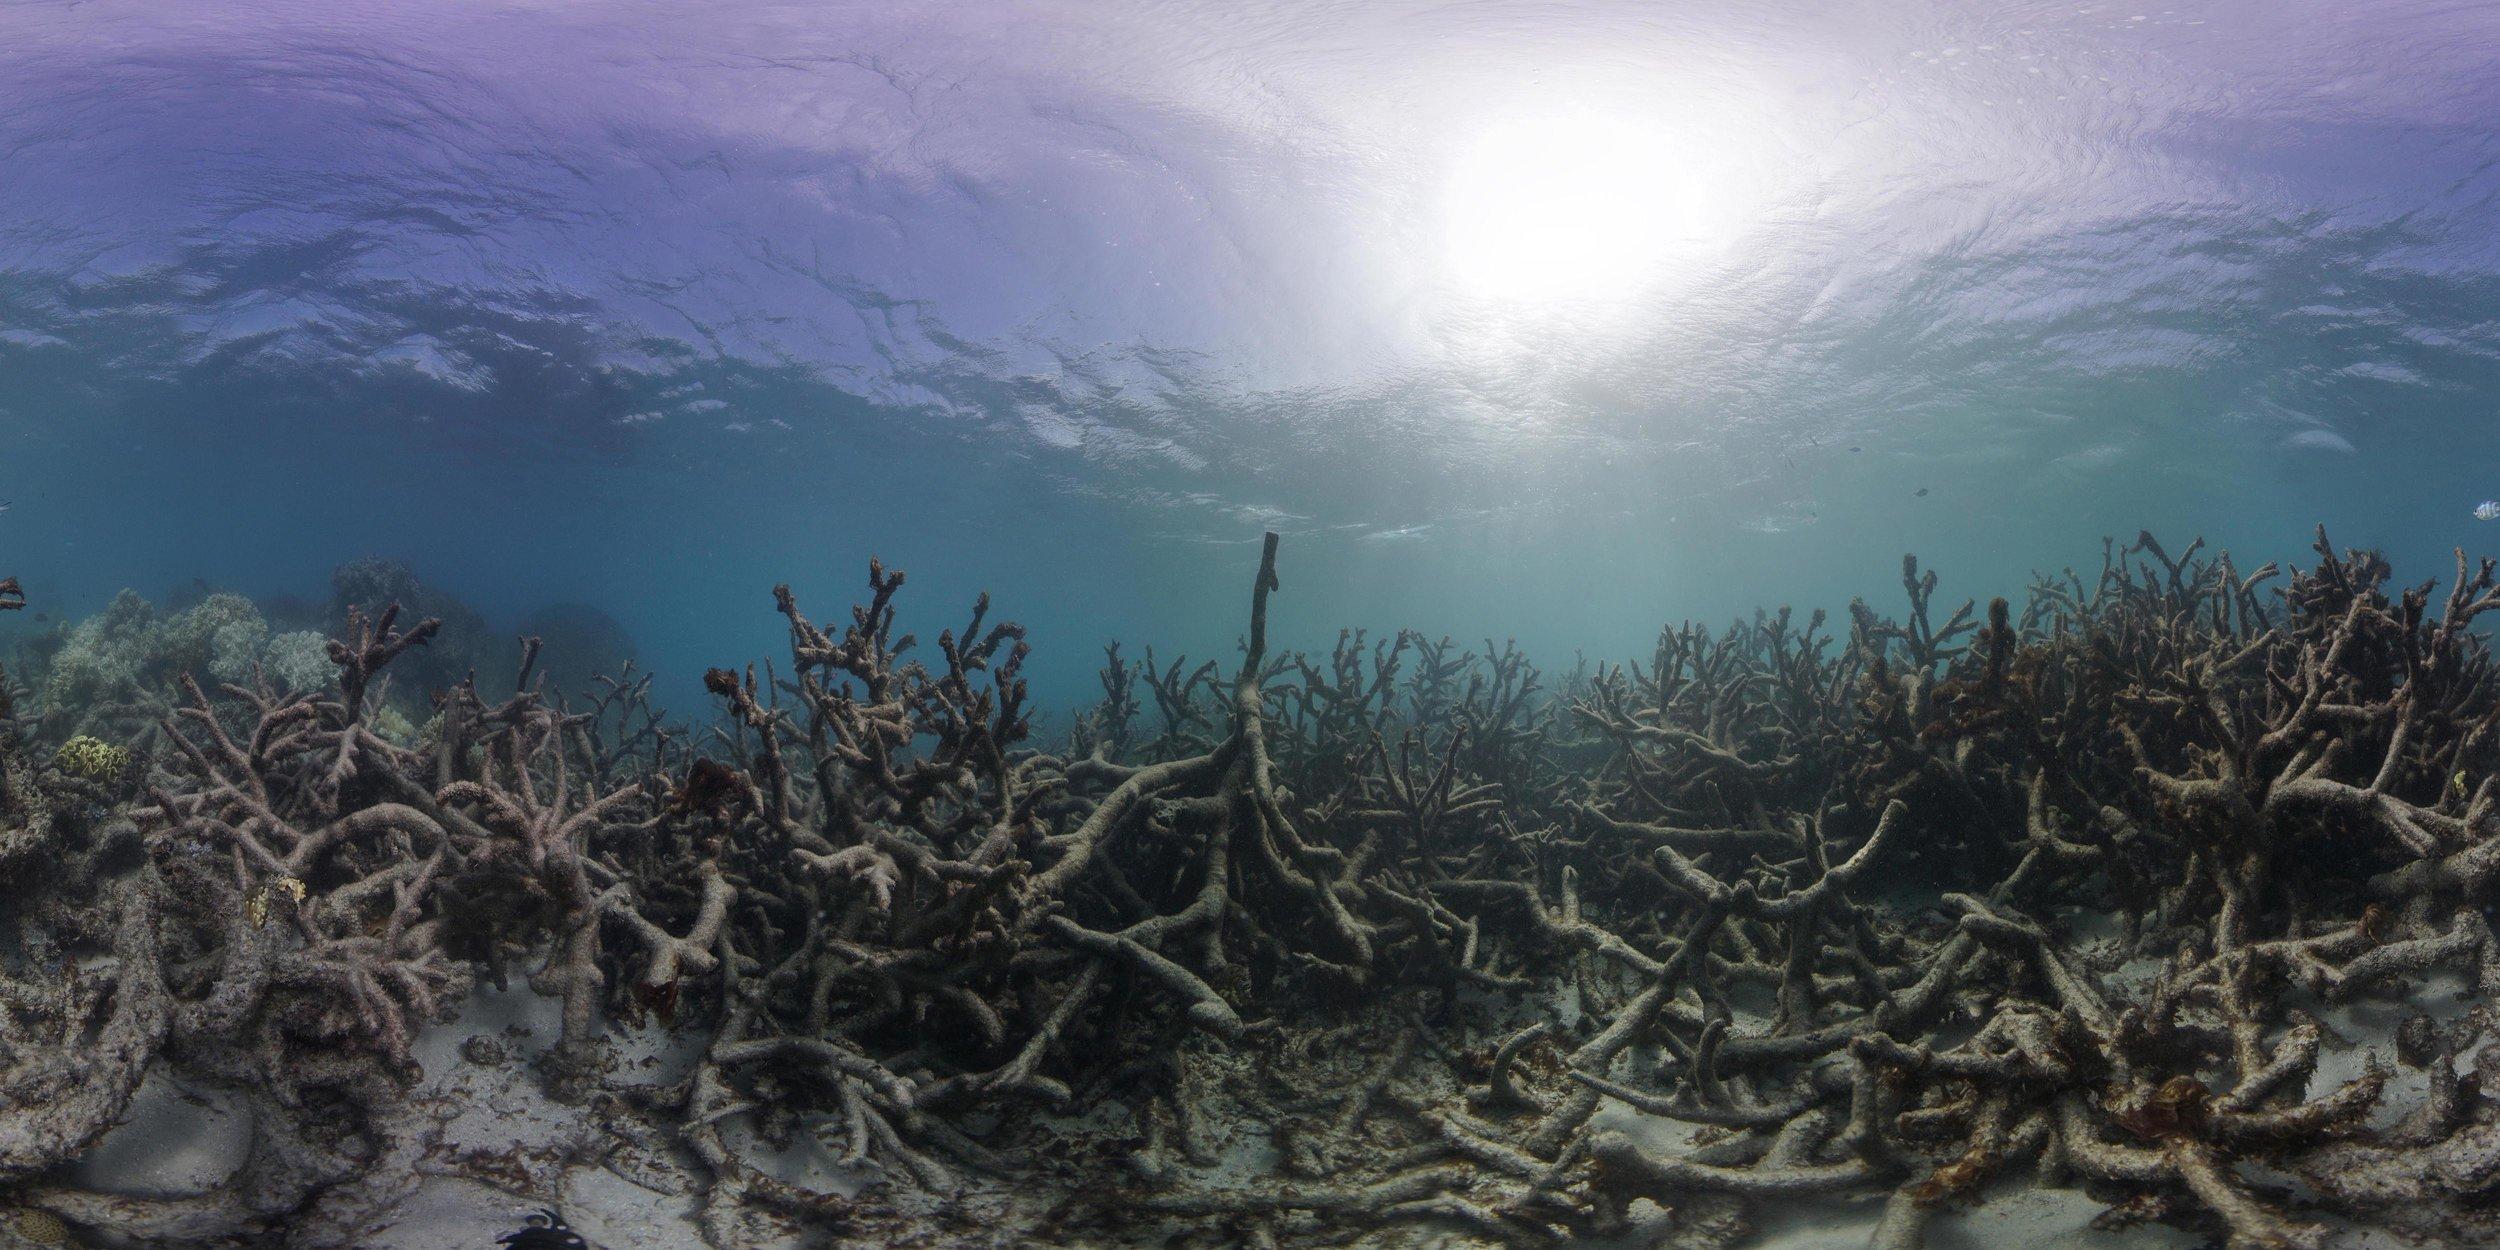 Lizard Island, GBR, may 2016 credit: THE OCEAN AGENCY / XL CATLIN SEAVIEW SURVEY